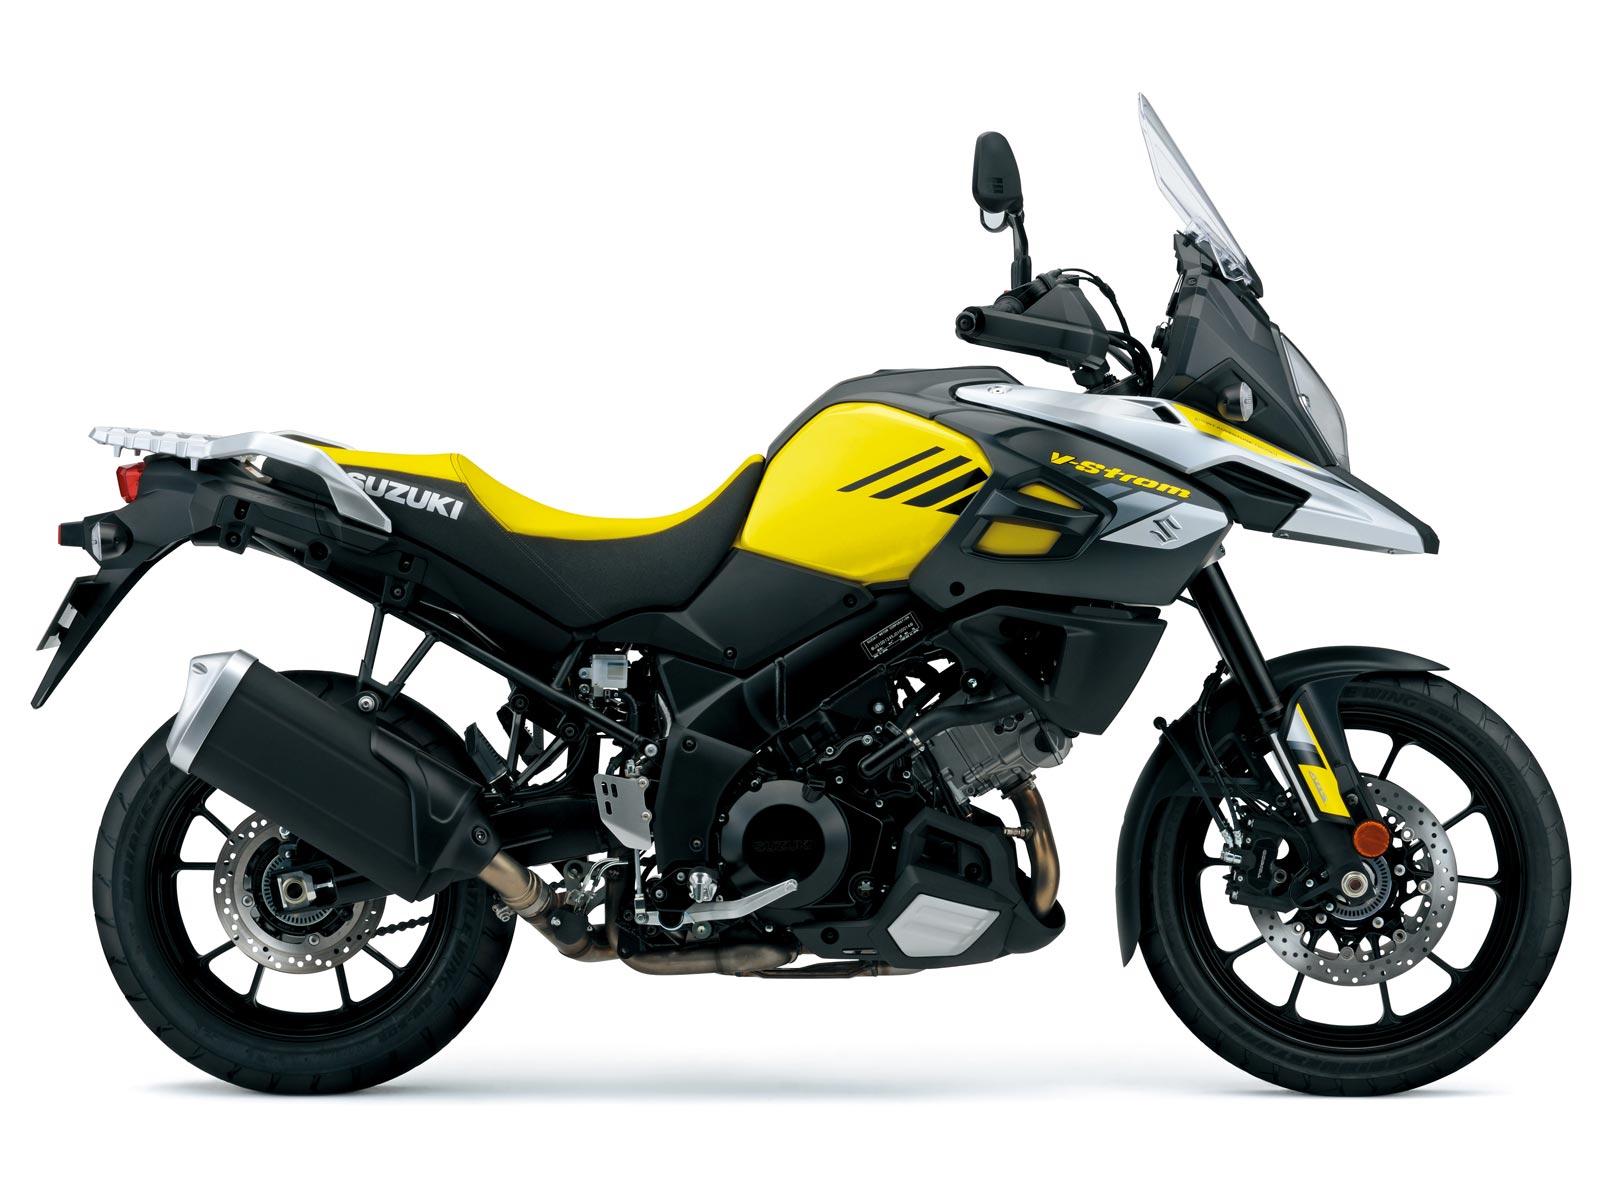 Moto del día: Suzuki V-Strom 1000 (2014)